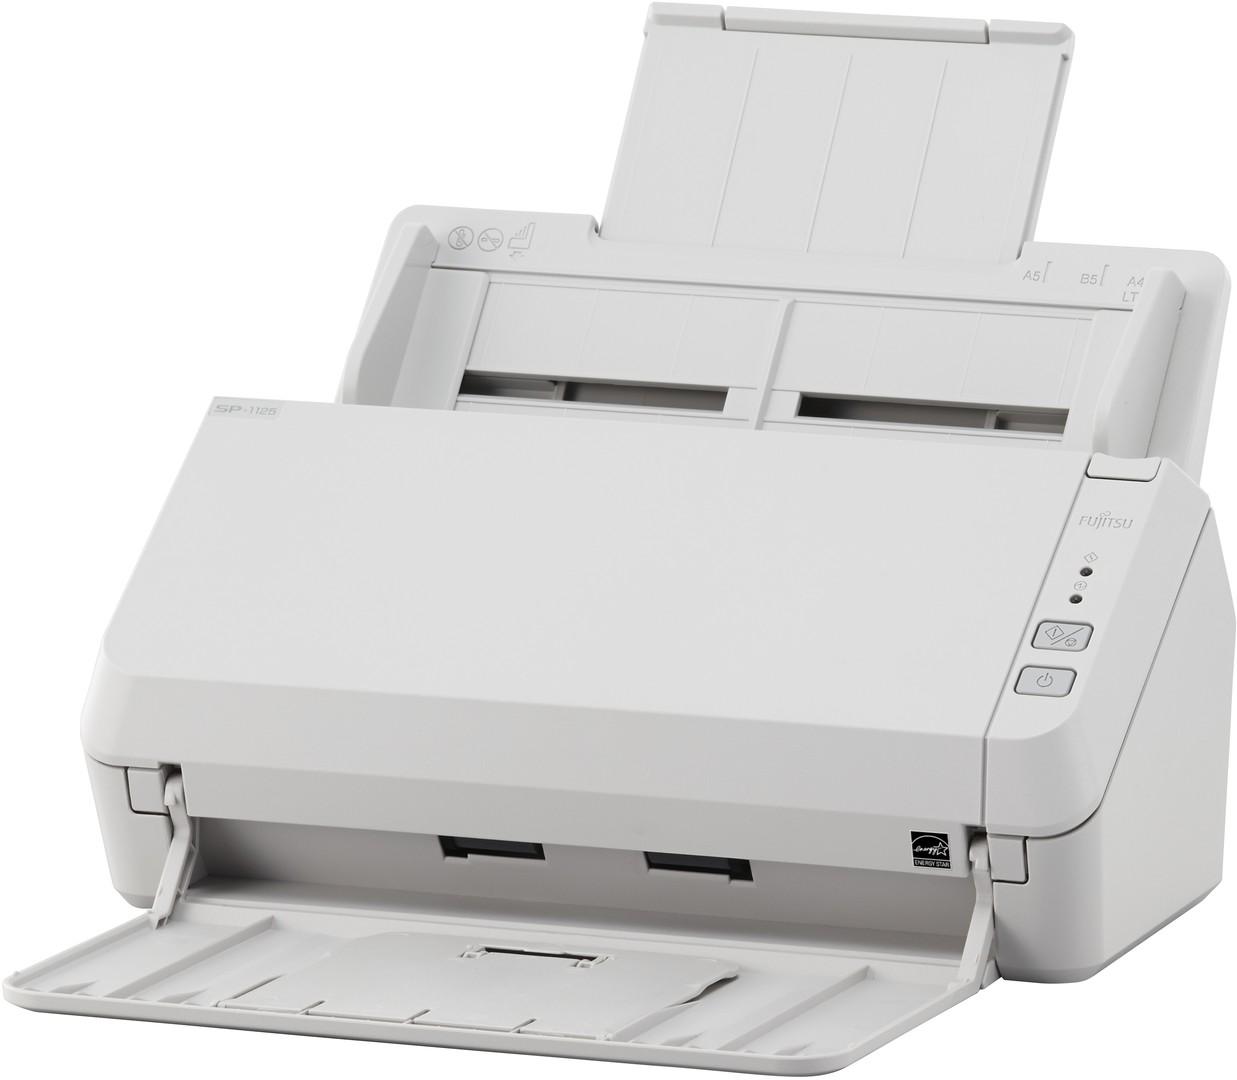 Fujitsu SP1125